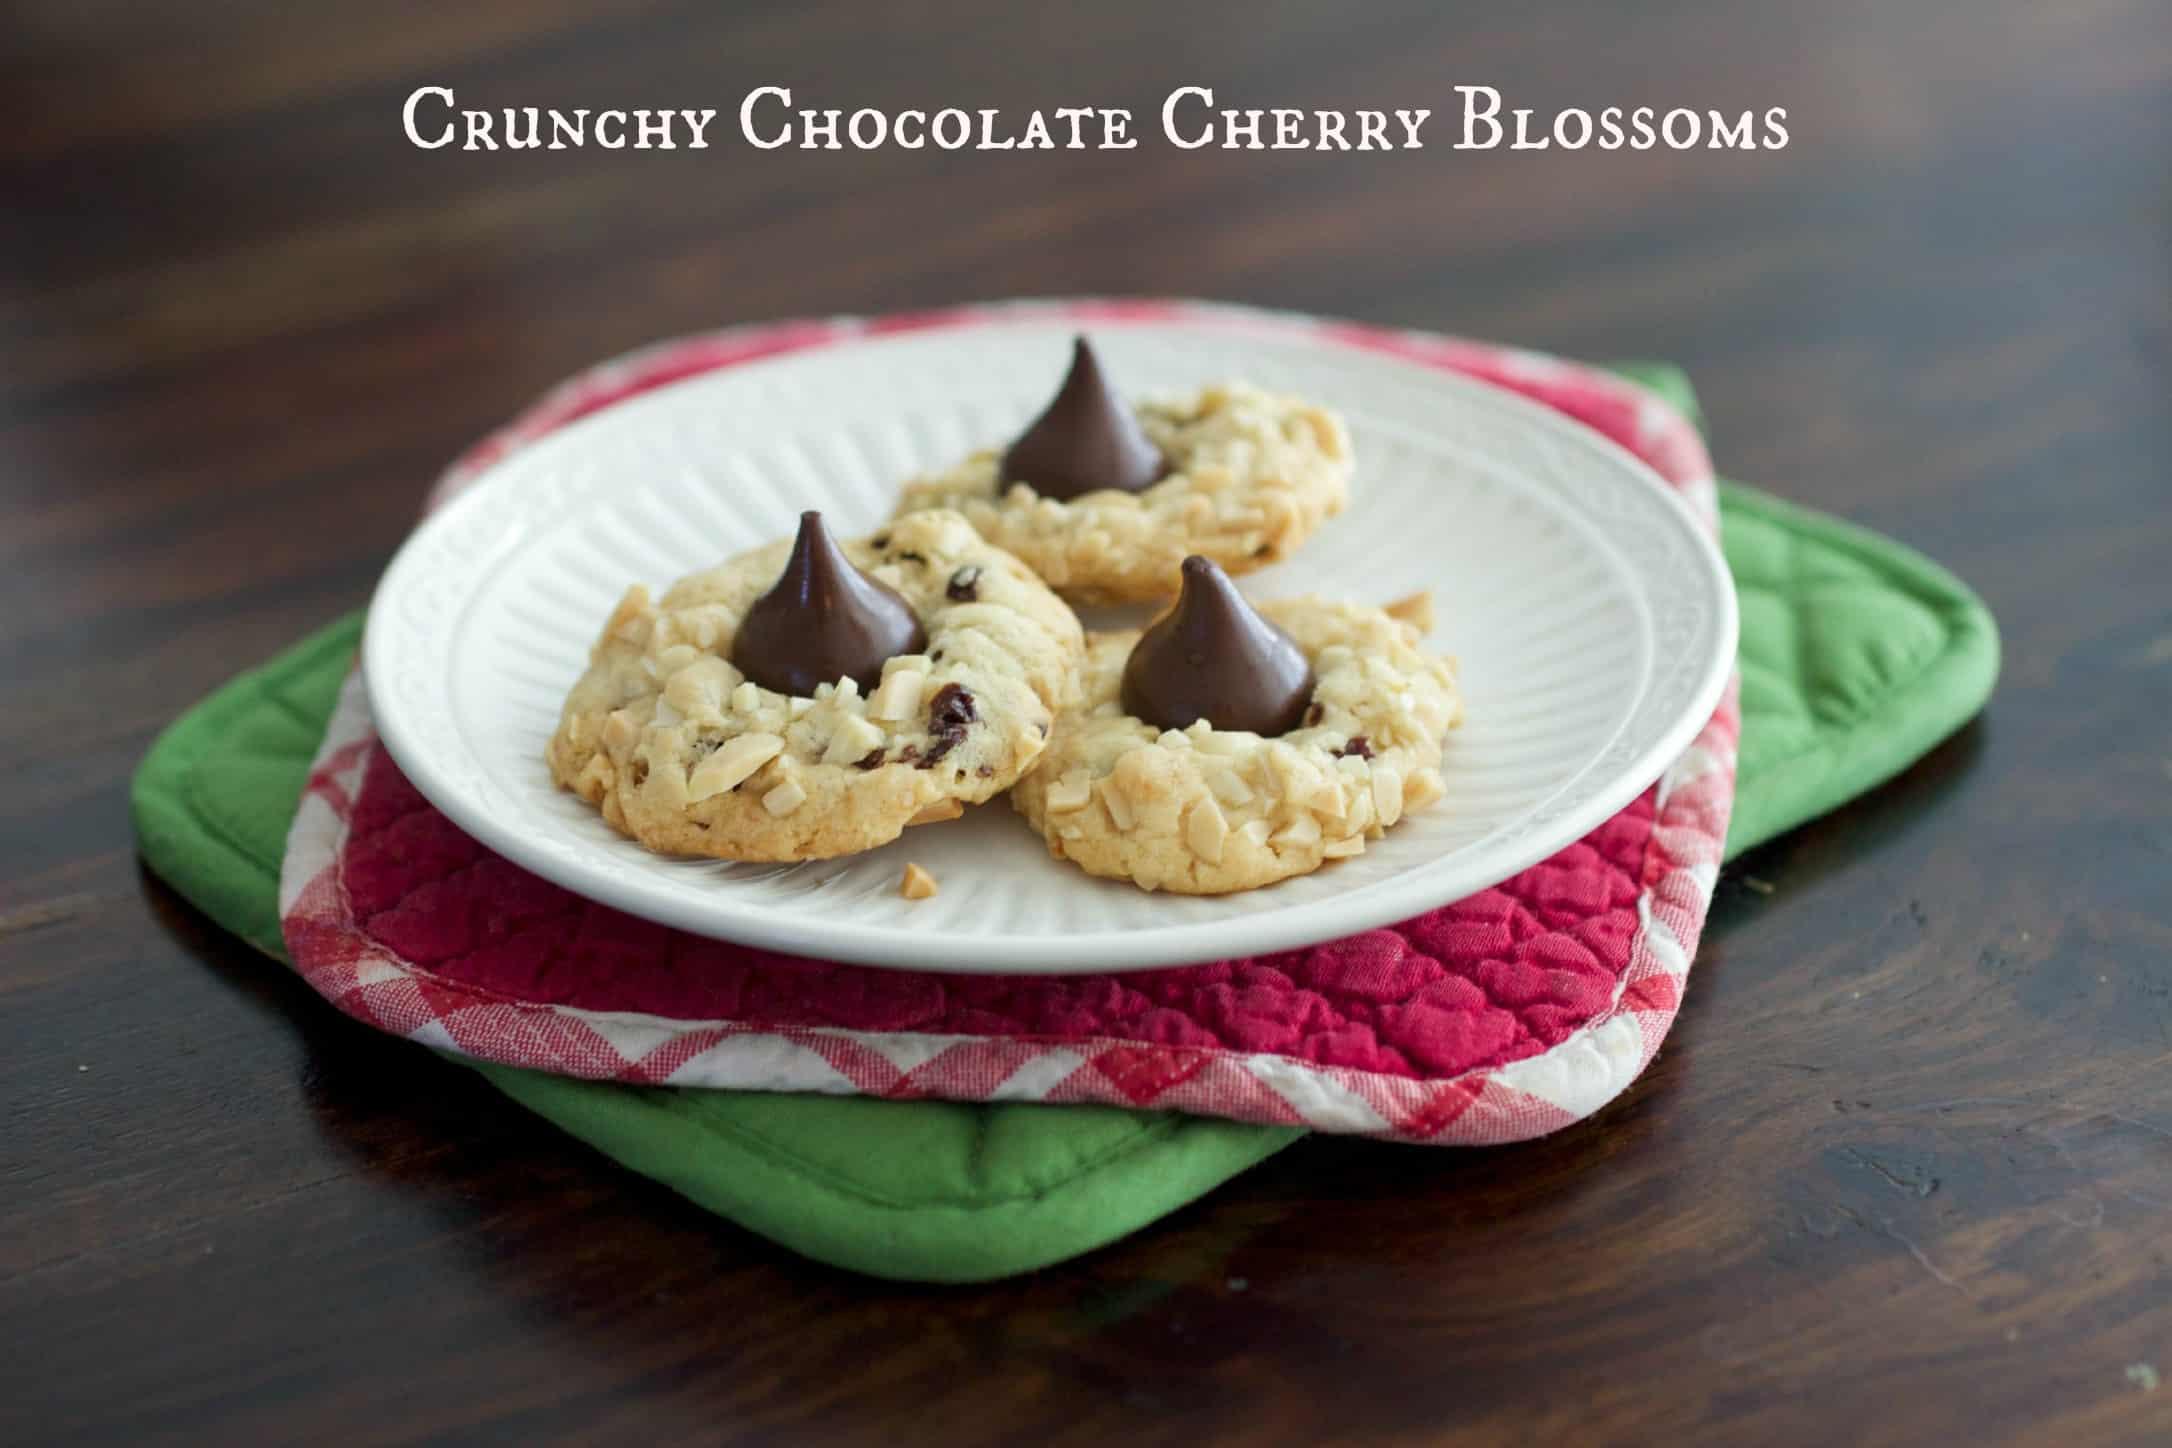 Crunchy Chocolate Cherry Blossoms